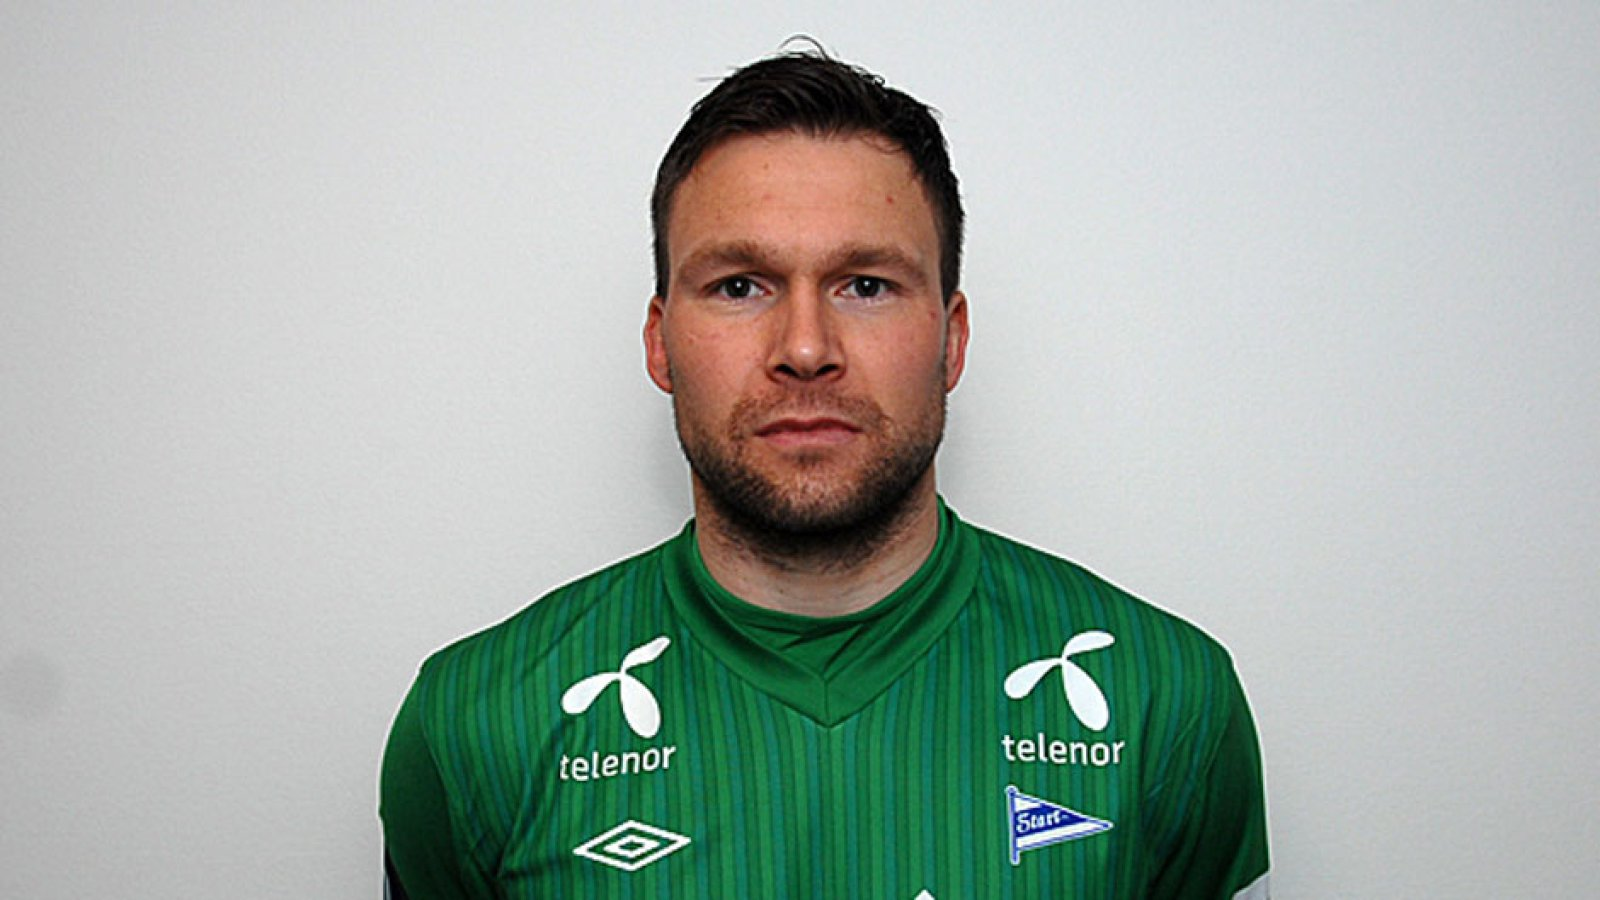 Håkon Opdal portrett 2014